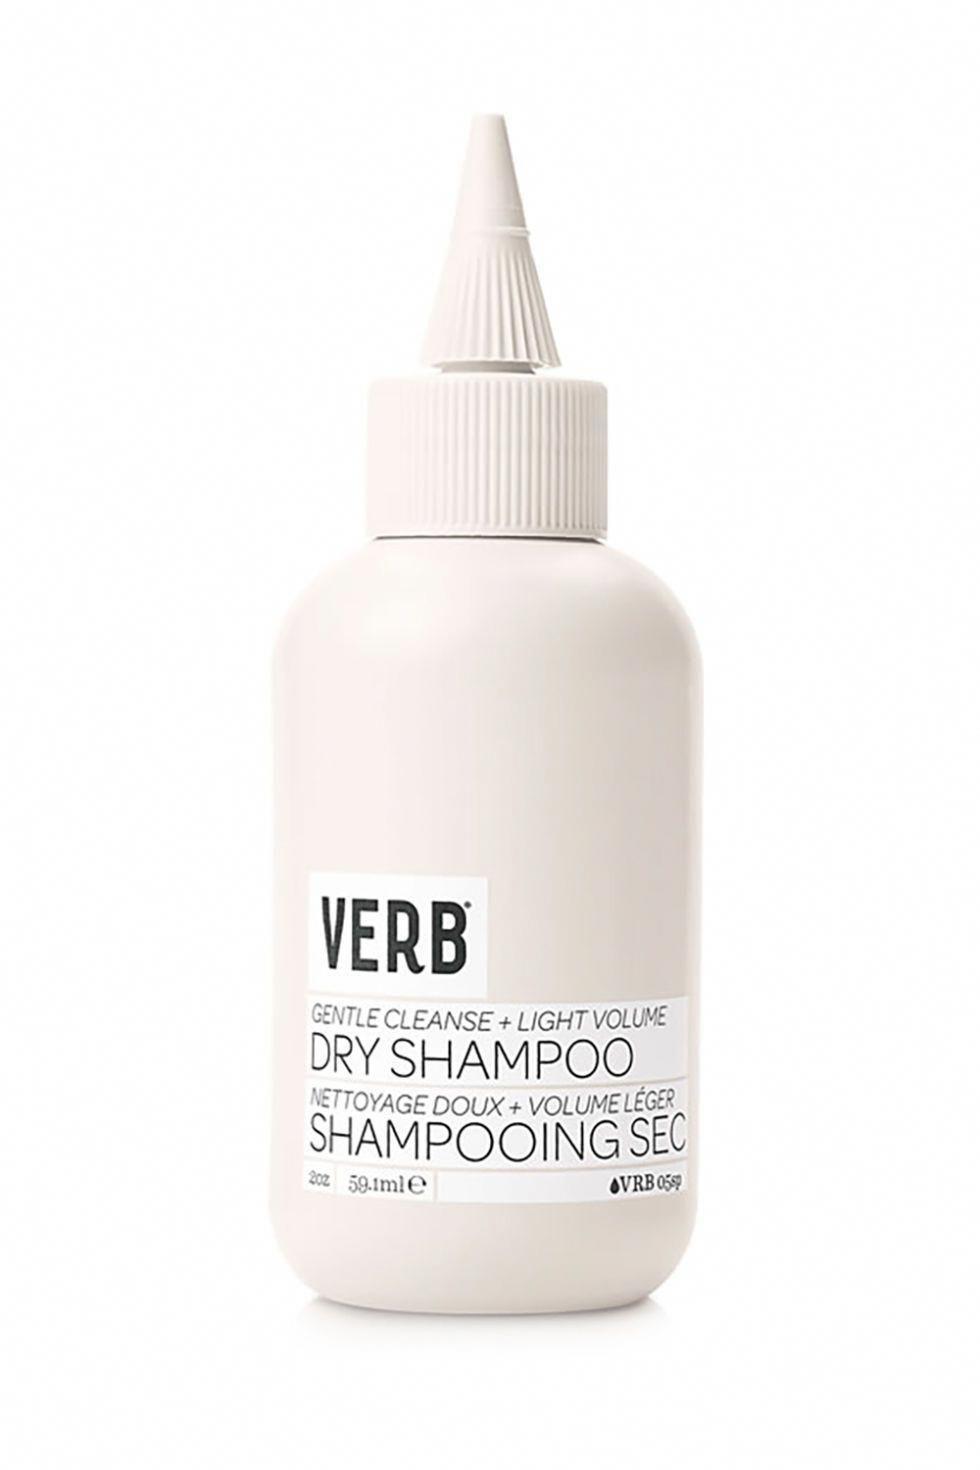 Verb Dry Shampoo at Sephora itlookshealthier it looks